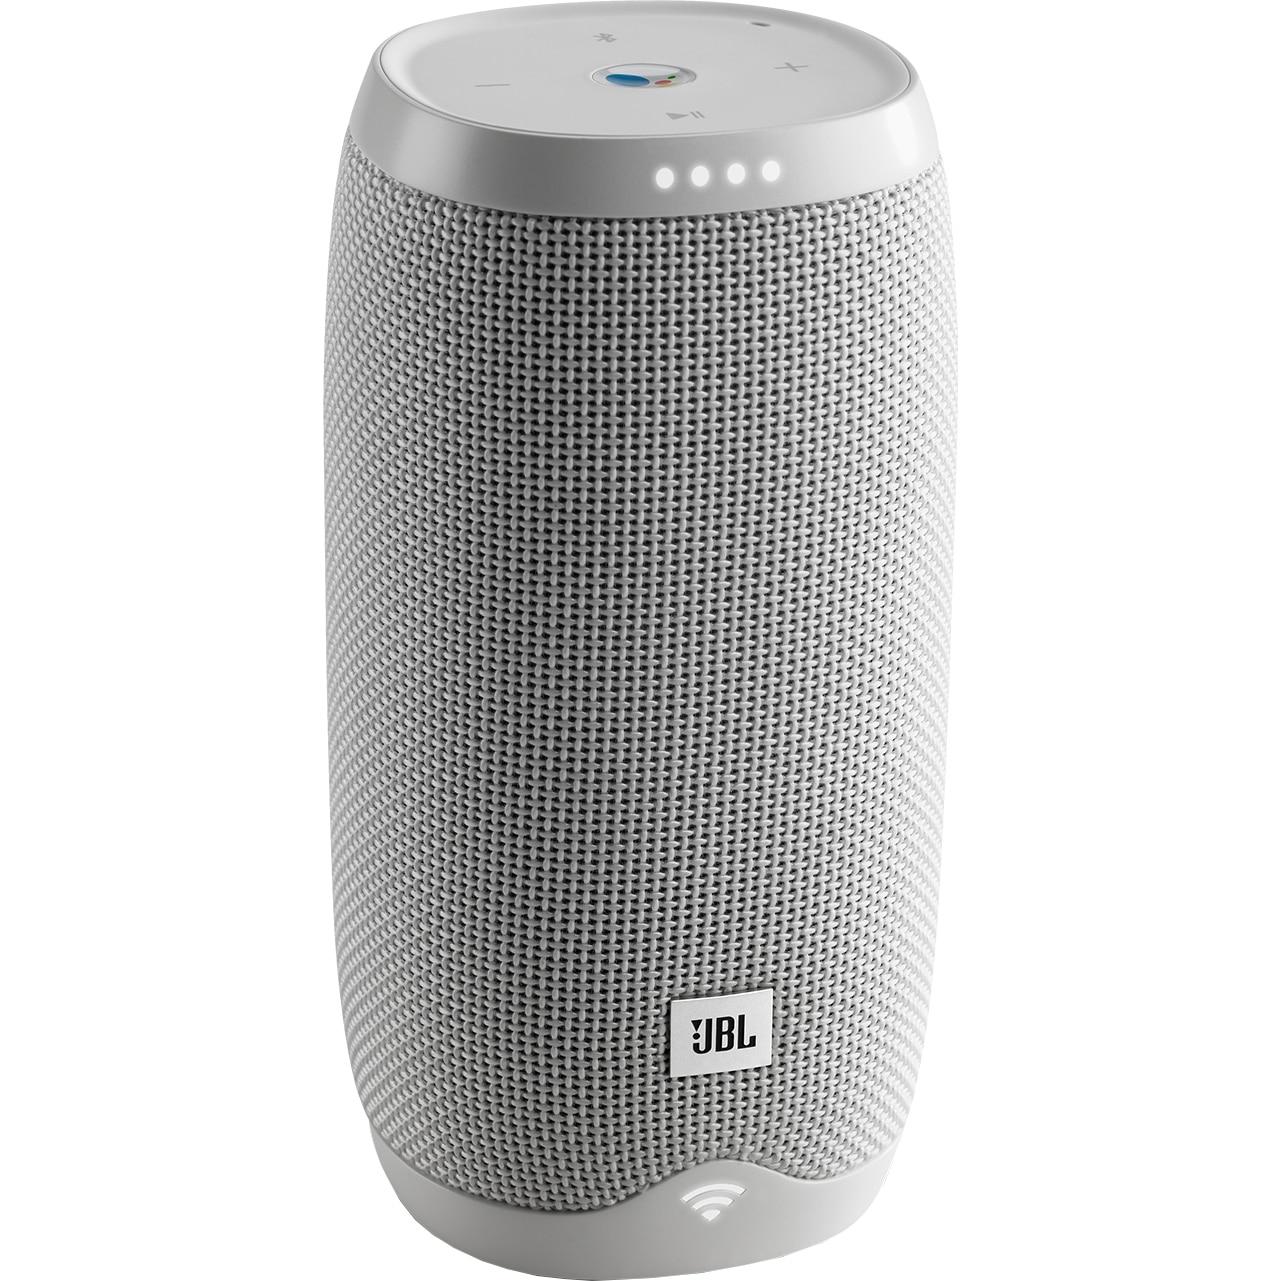 Fotografie Boxa portabila JBL LINK10, Smart, Google Assistant, Multi-room, Smart Home Control, IPX7 Waterproof, HD Audio, WiFi & Bluetooth, 5h Playback, alb